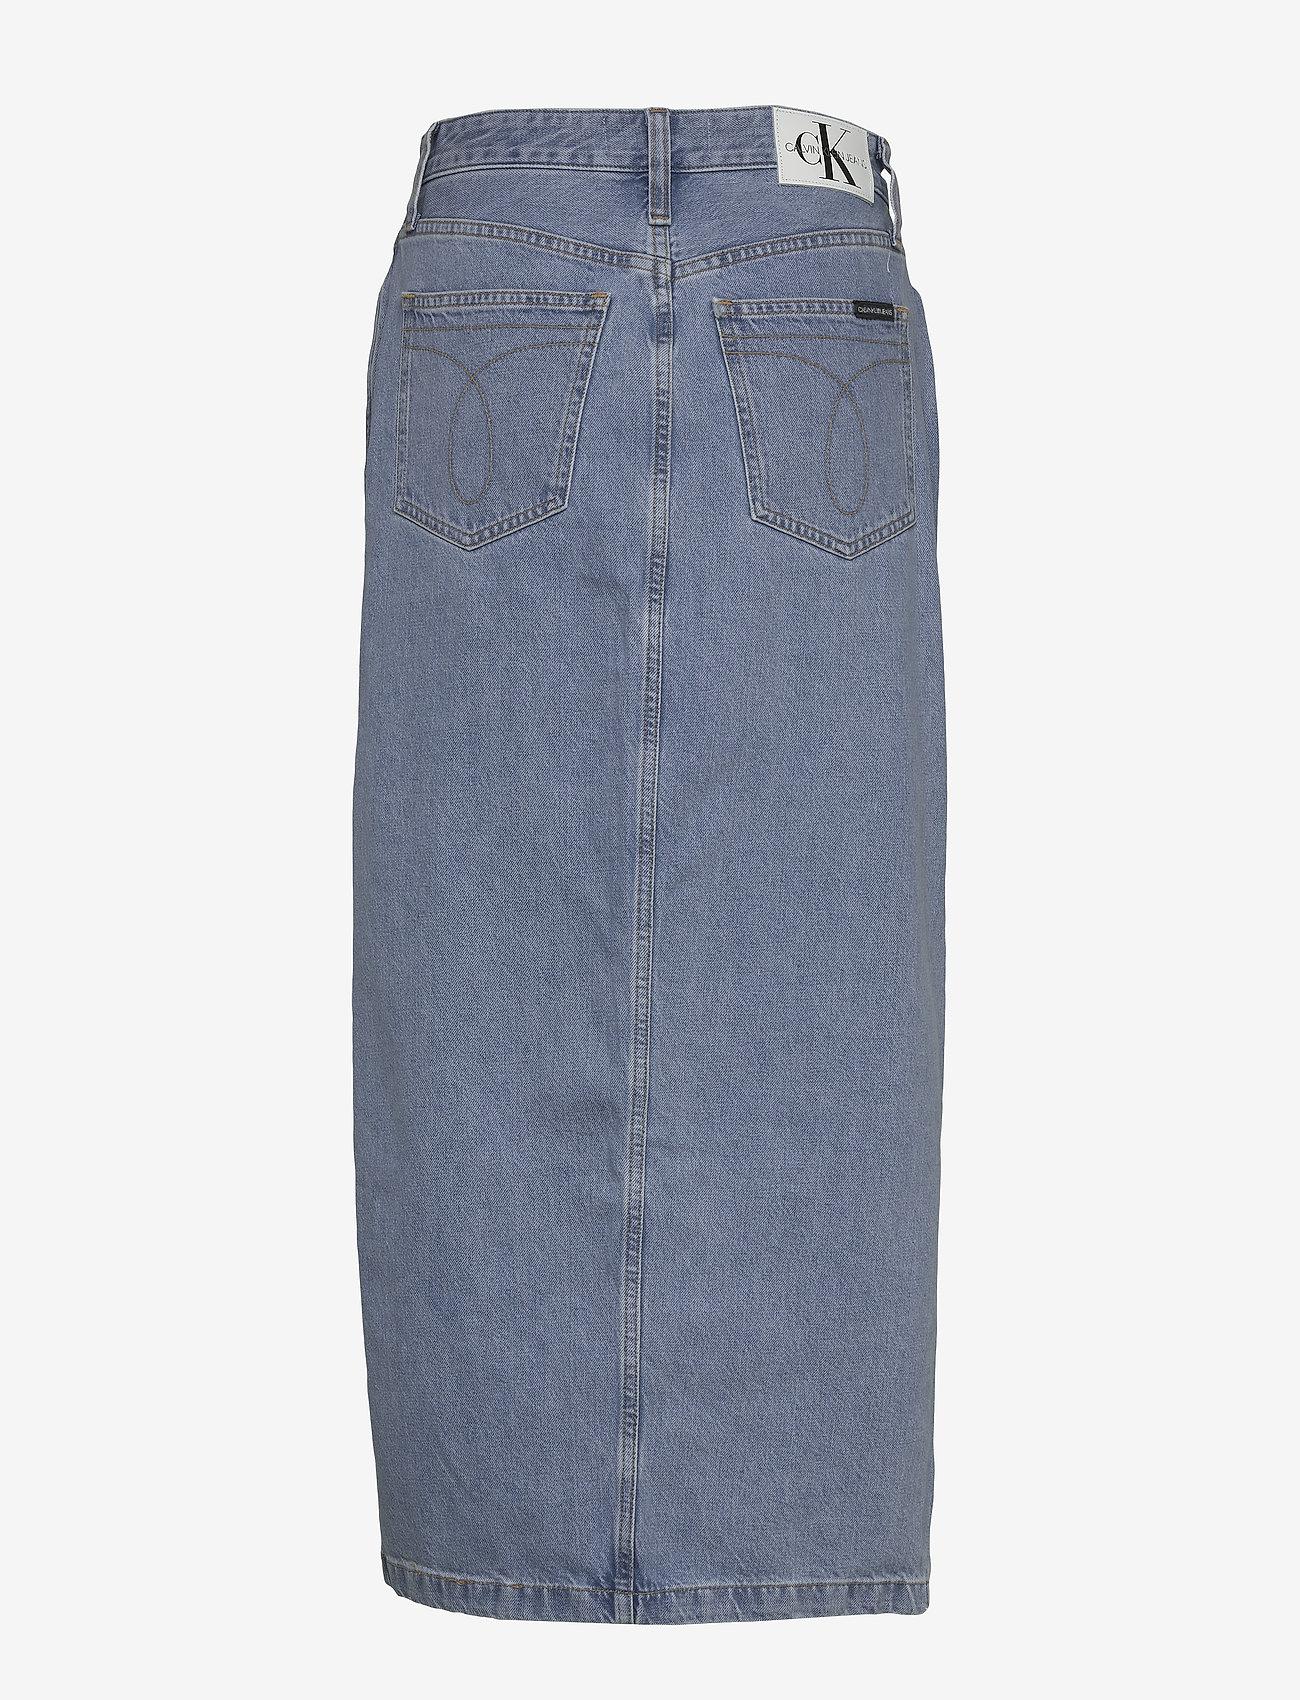 Maxi Skirt (Da087 Icn Light Blue) (660 kr) - Calvin Klein Jeans